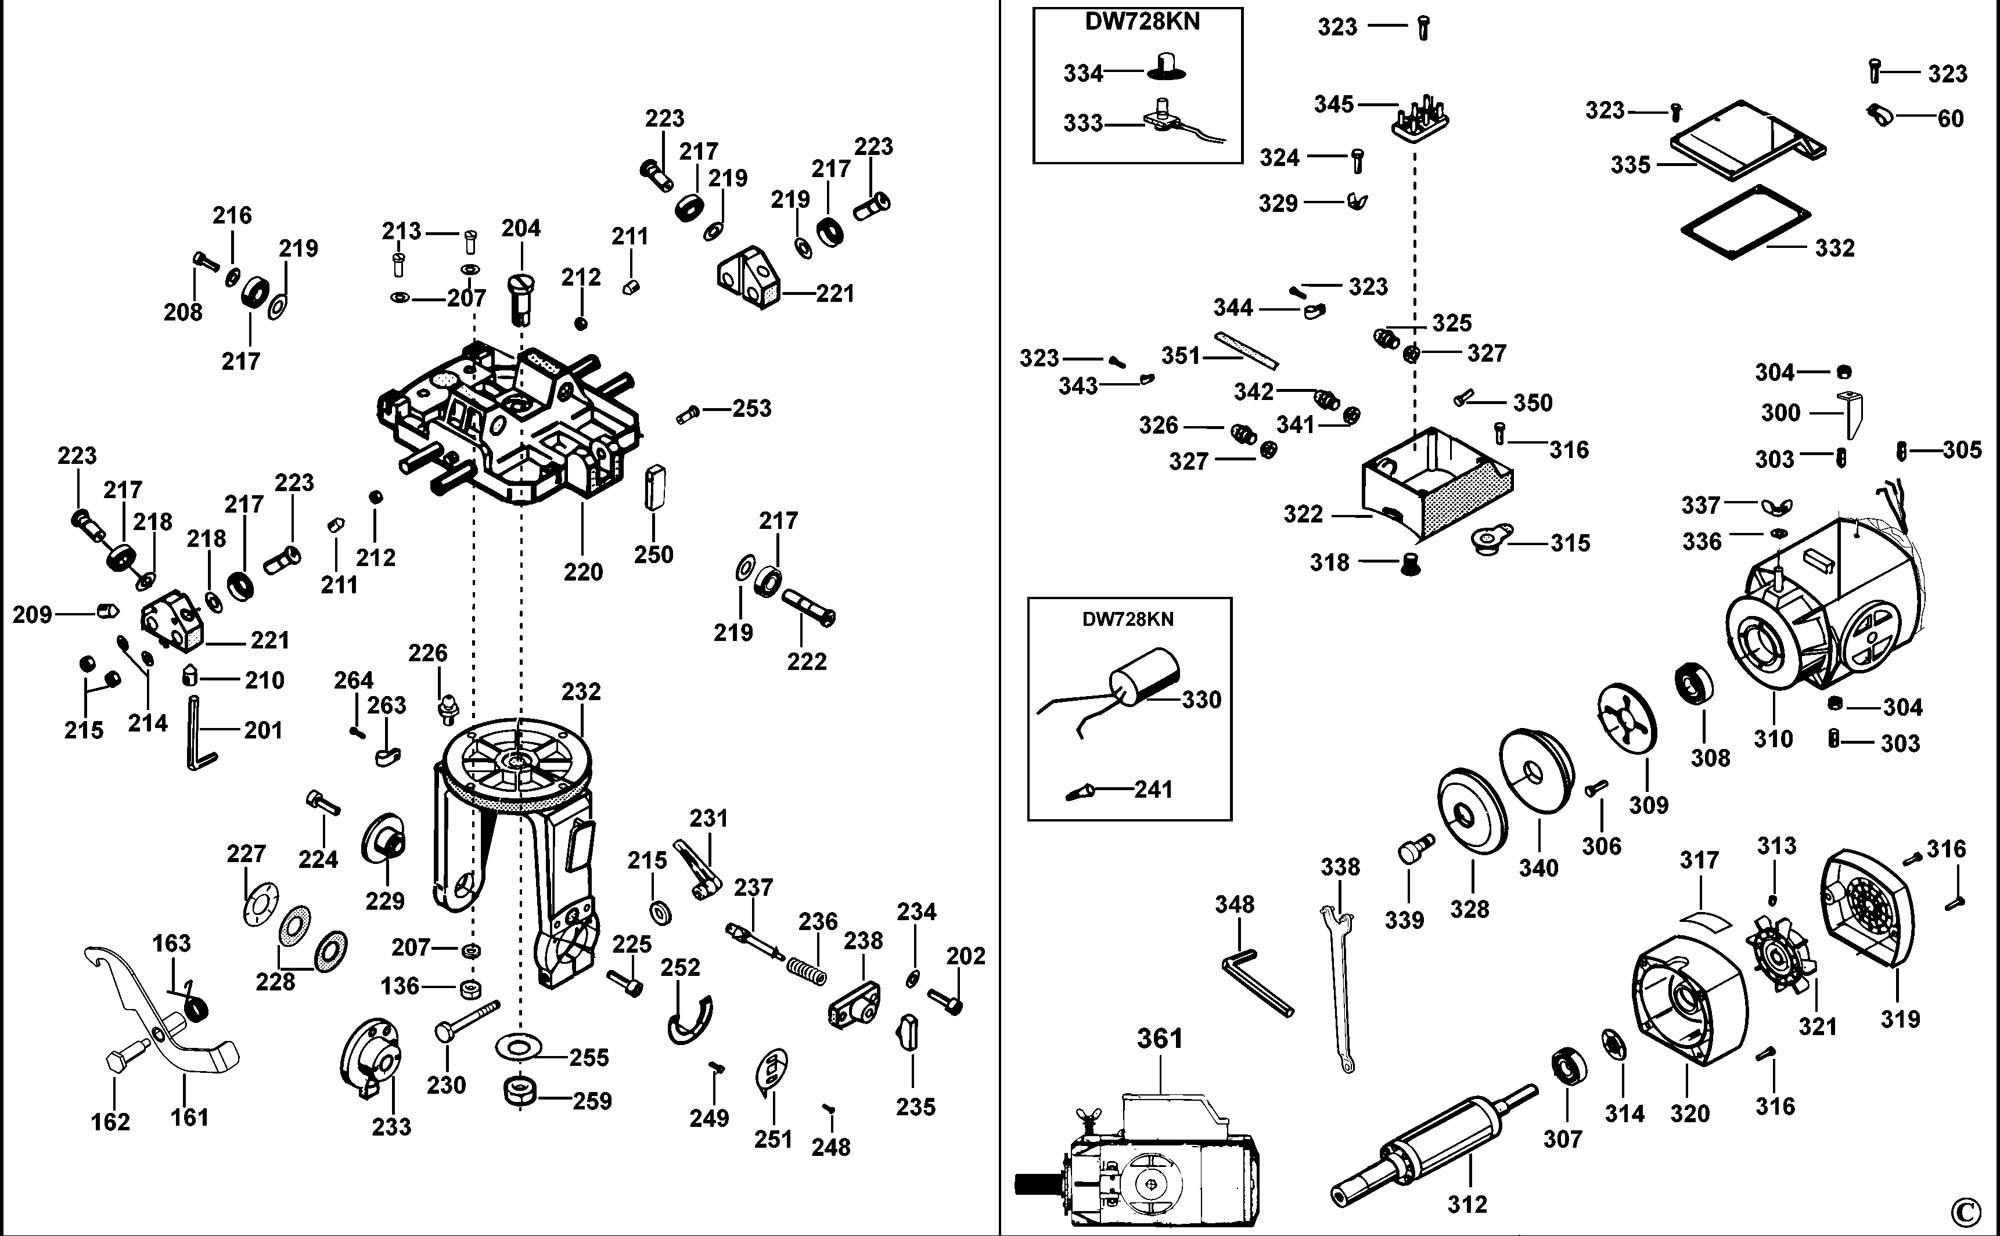 Spares For Dewalt Dw728kn Radial Arm Saw Type 1 Spare